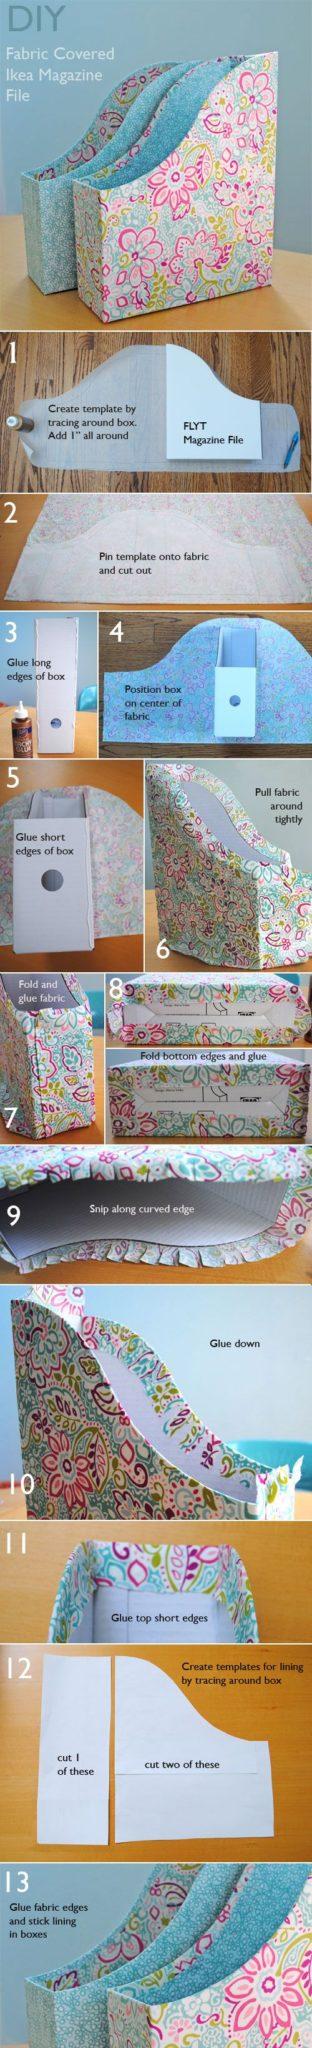 manualidades de cajas de carton organizadoras forradas con papel de scrap